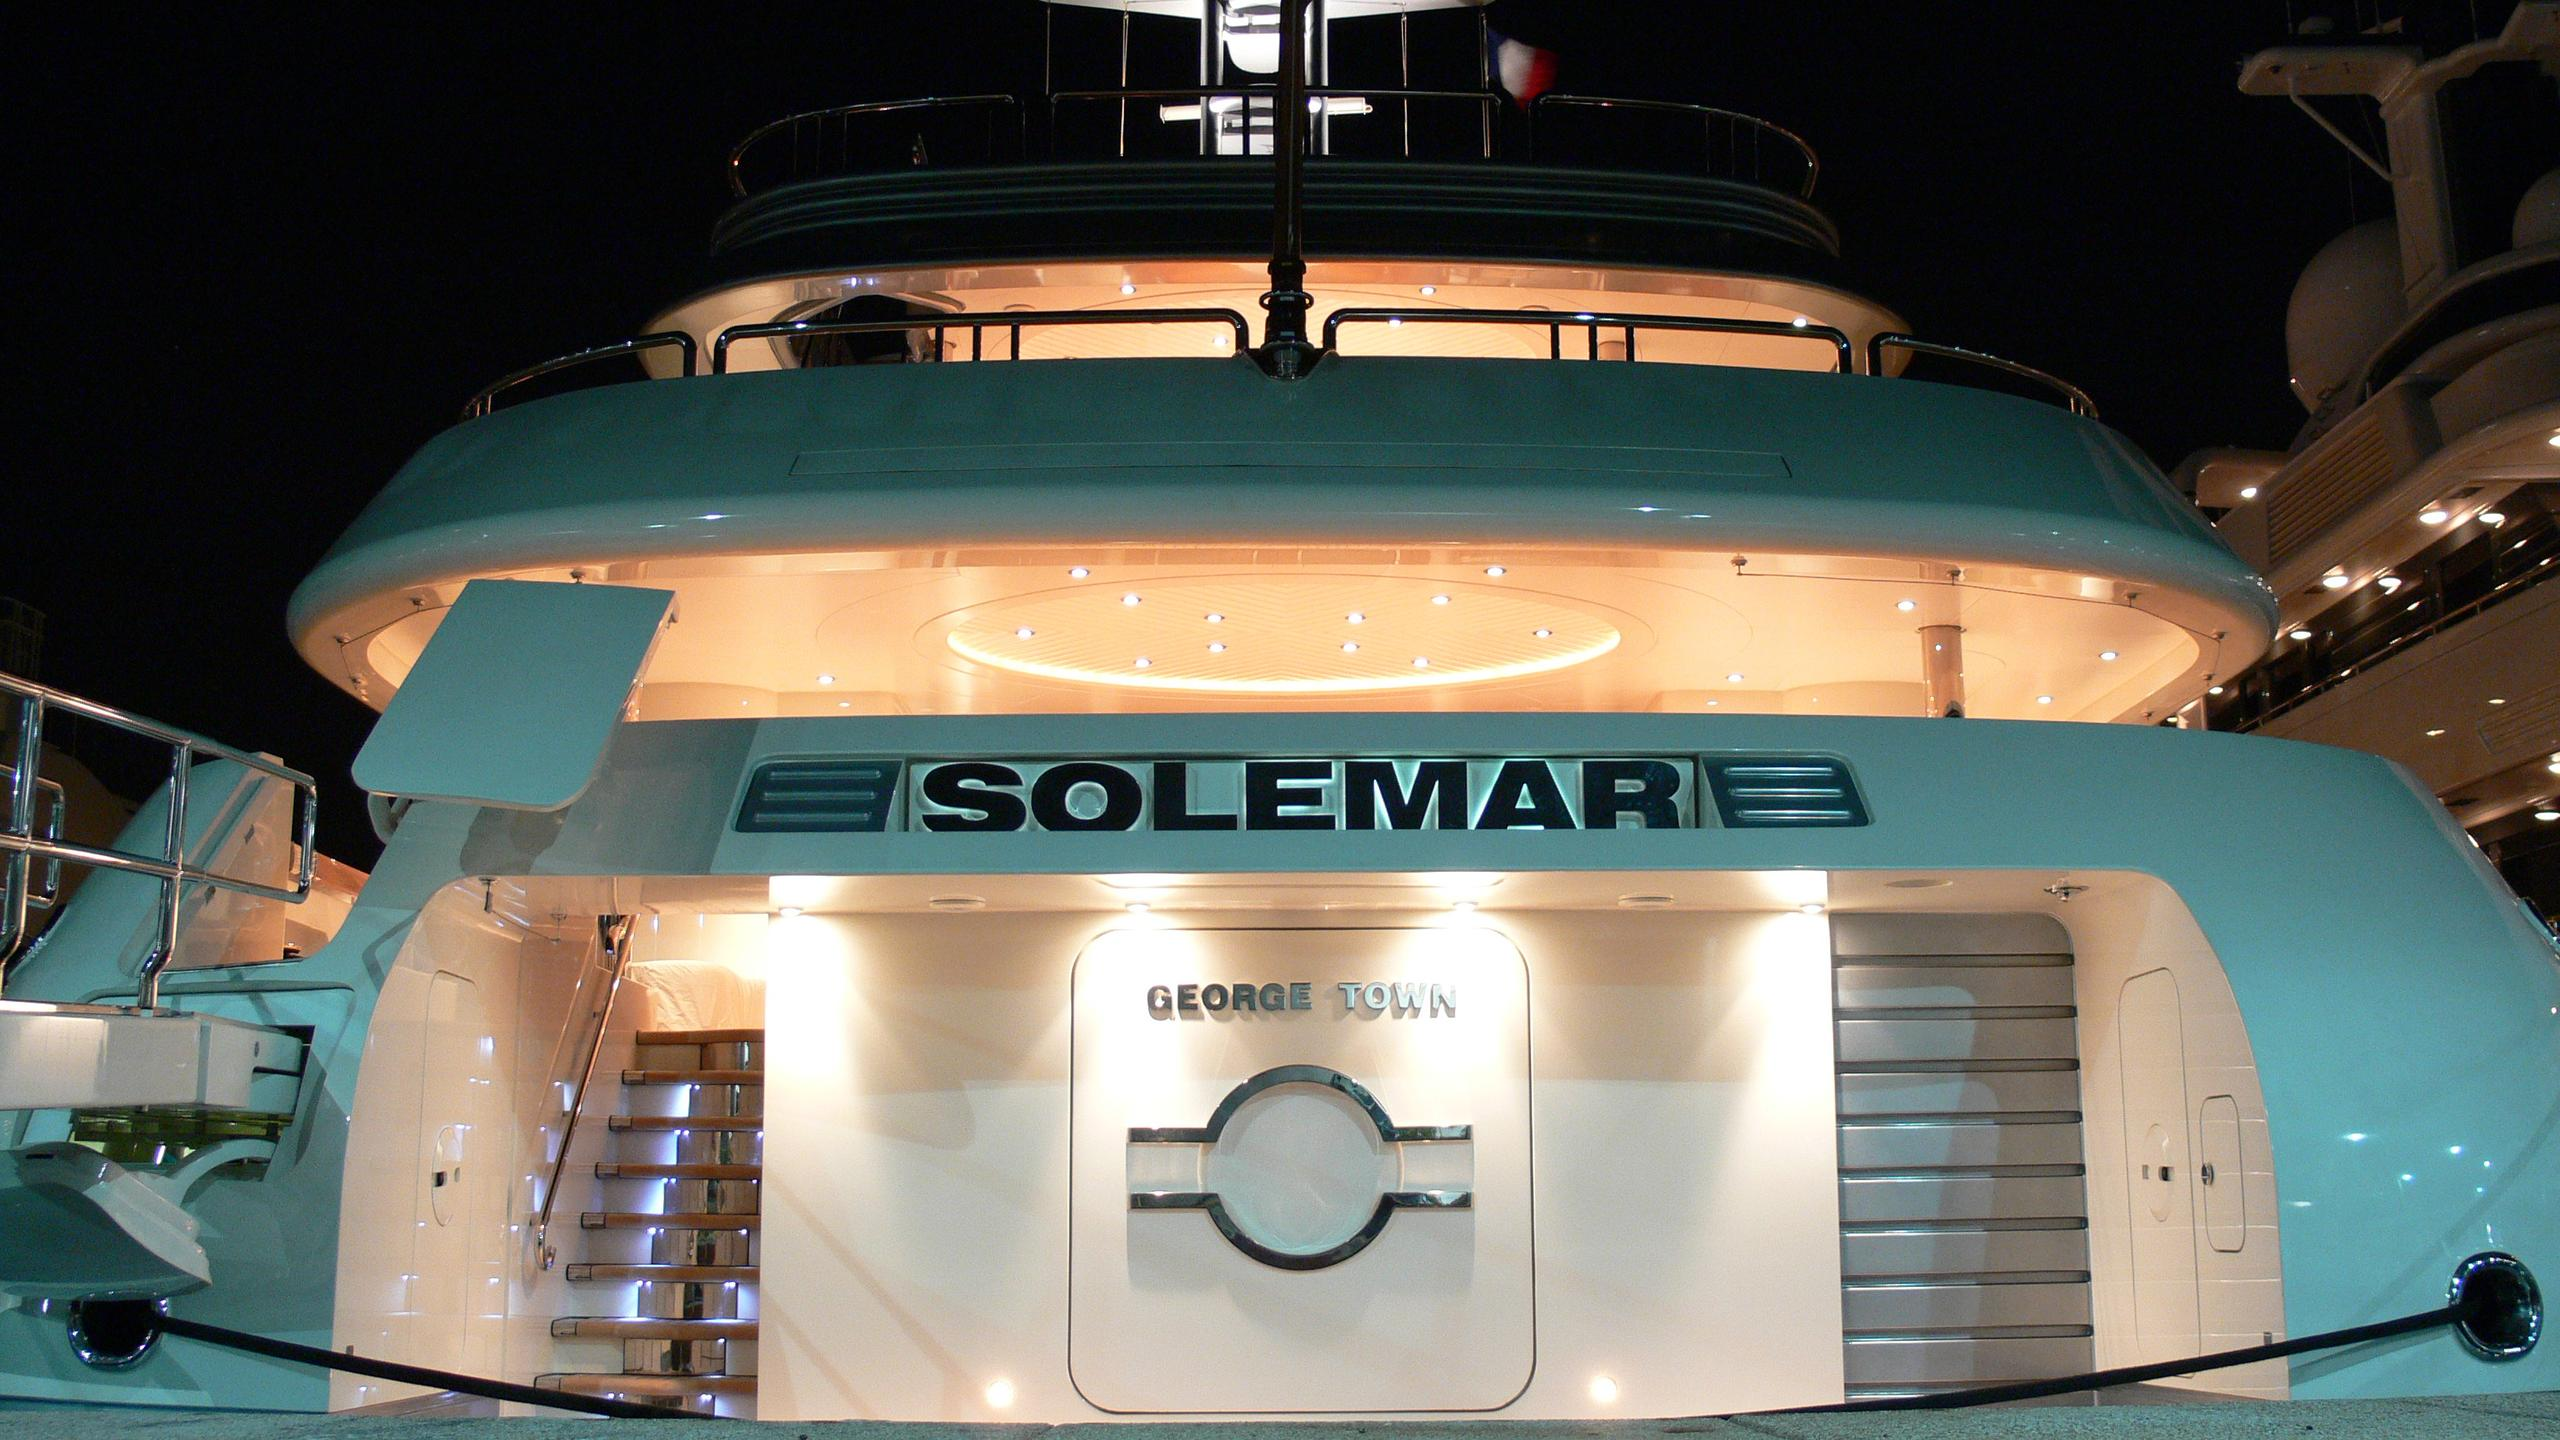 calypso-solemar-motor-yacht-amels-2003-61m-stern